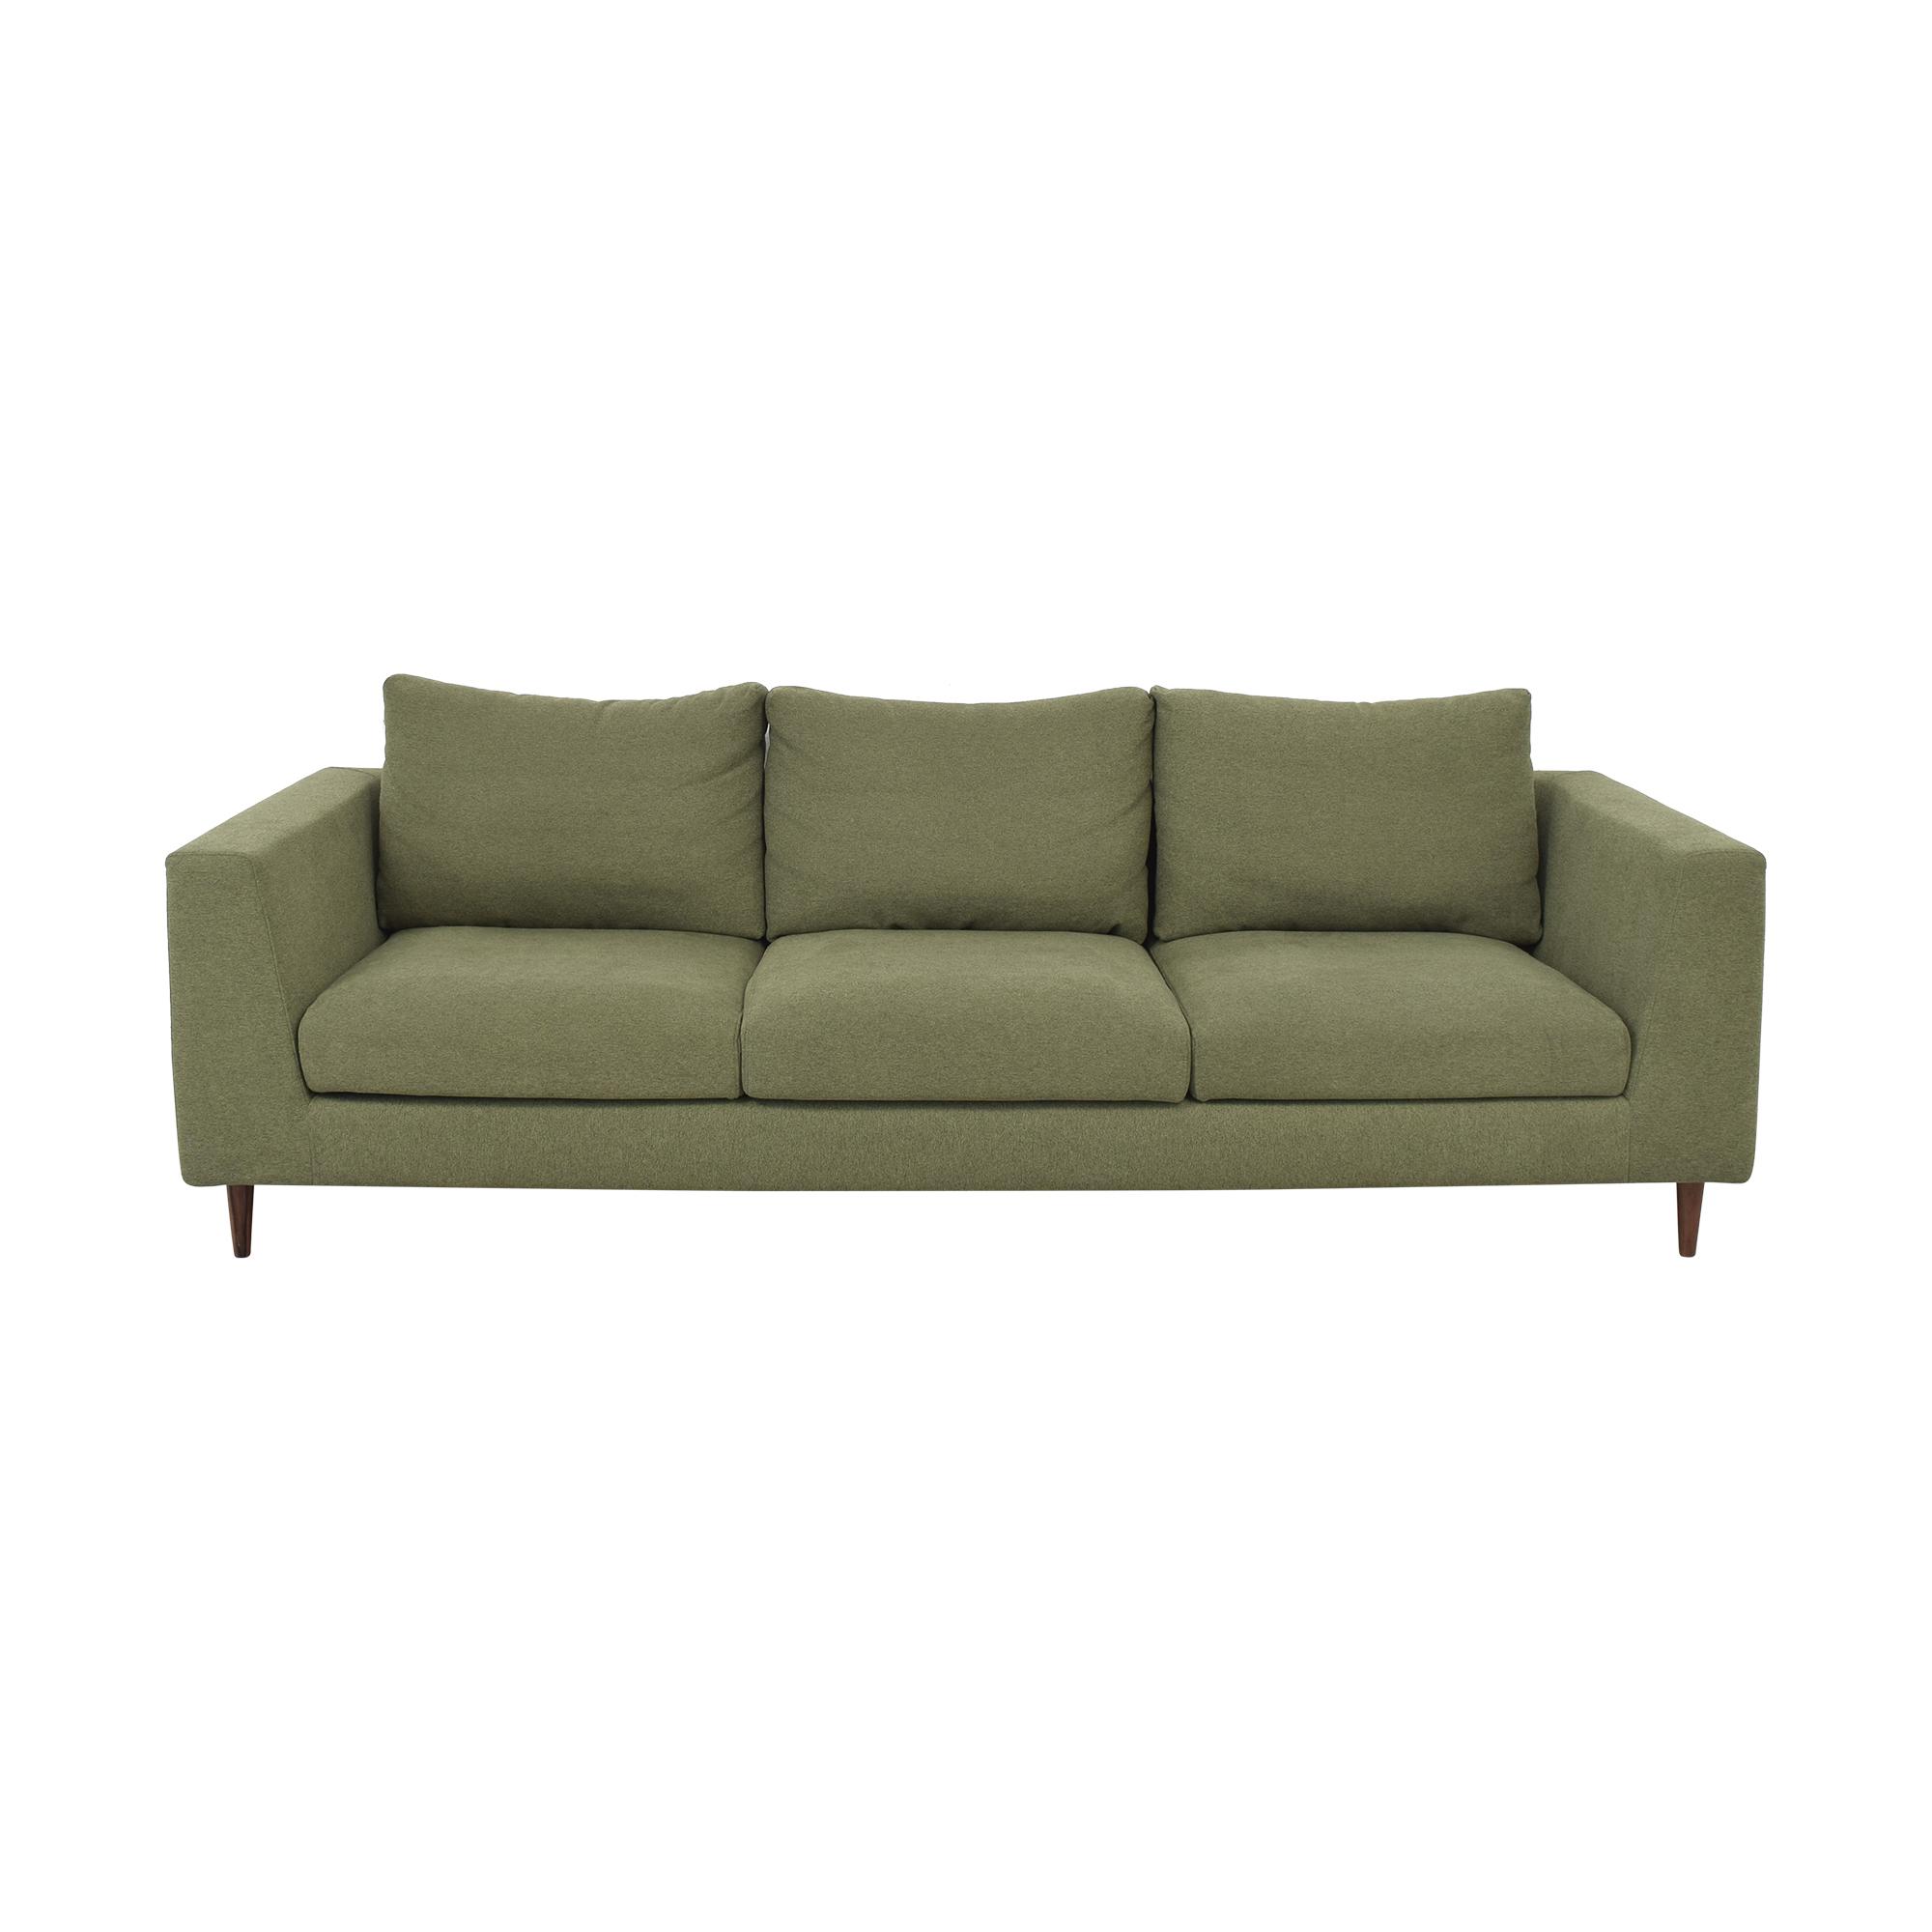 Interior Define Interior Define Asher Sofa on sale